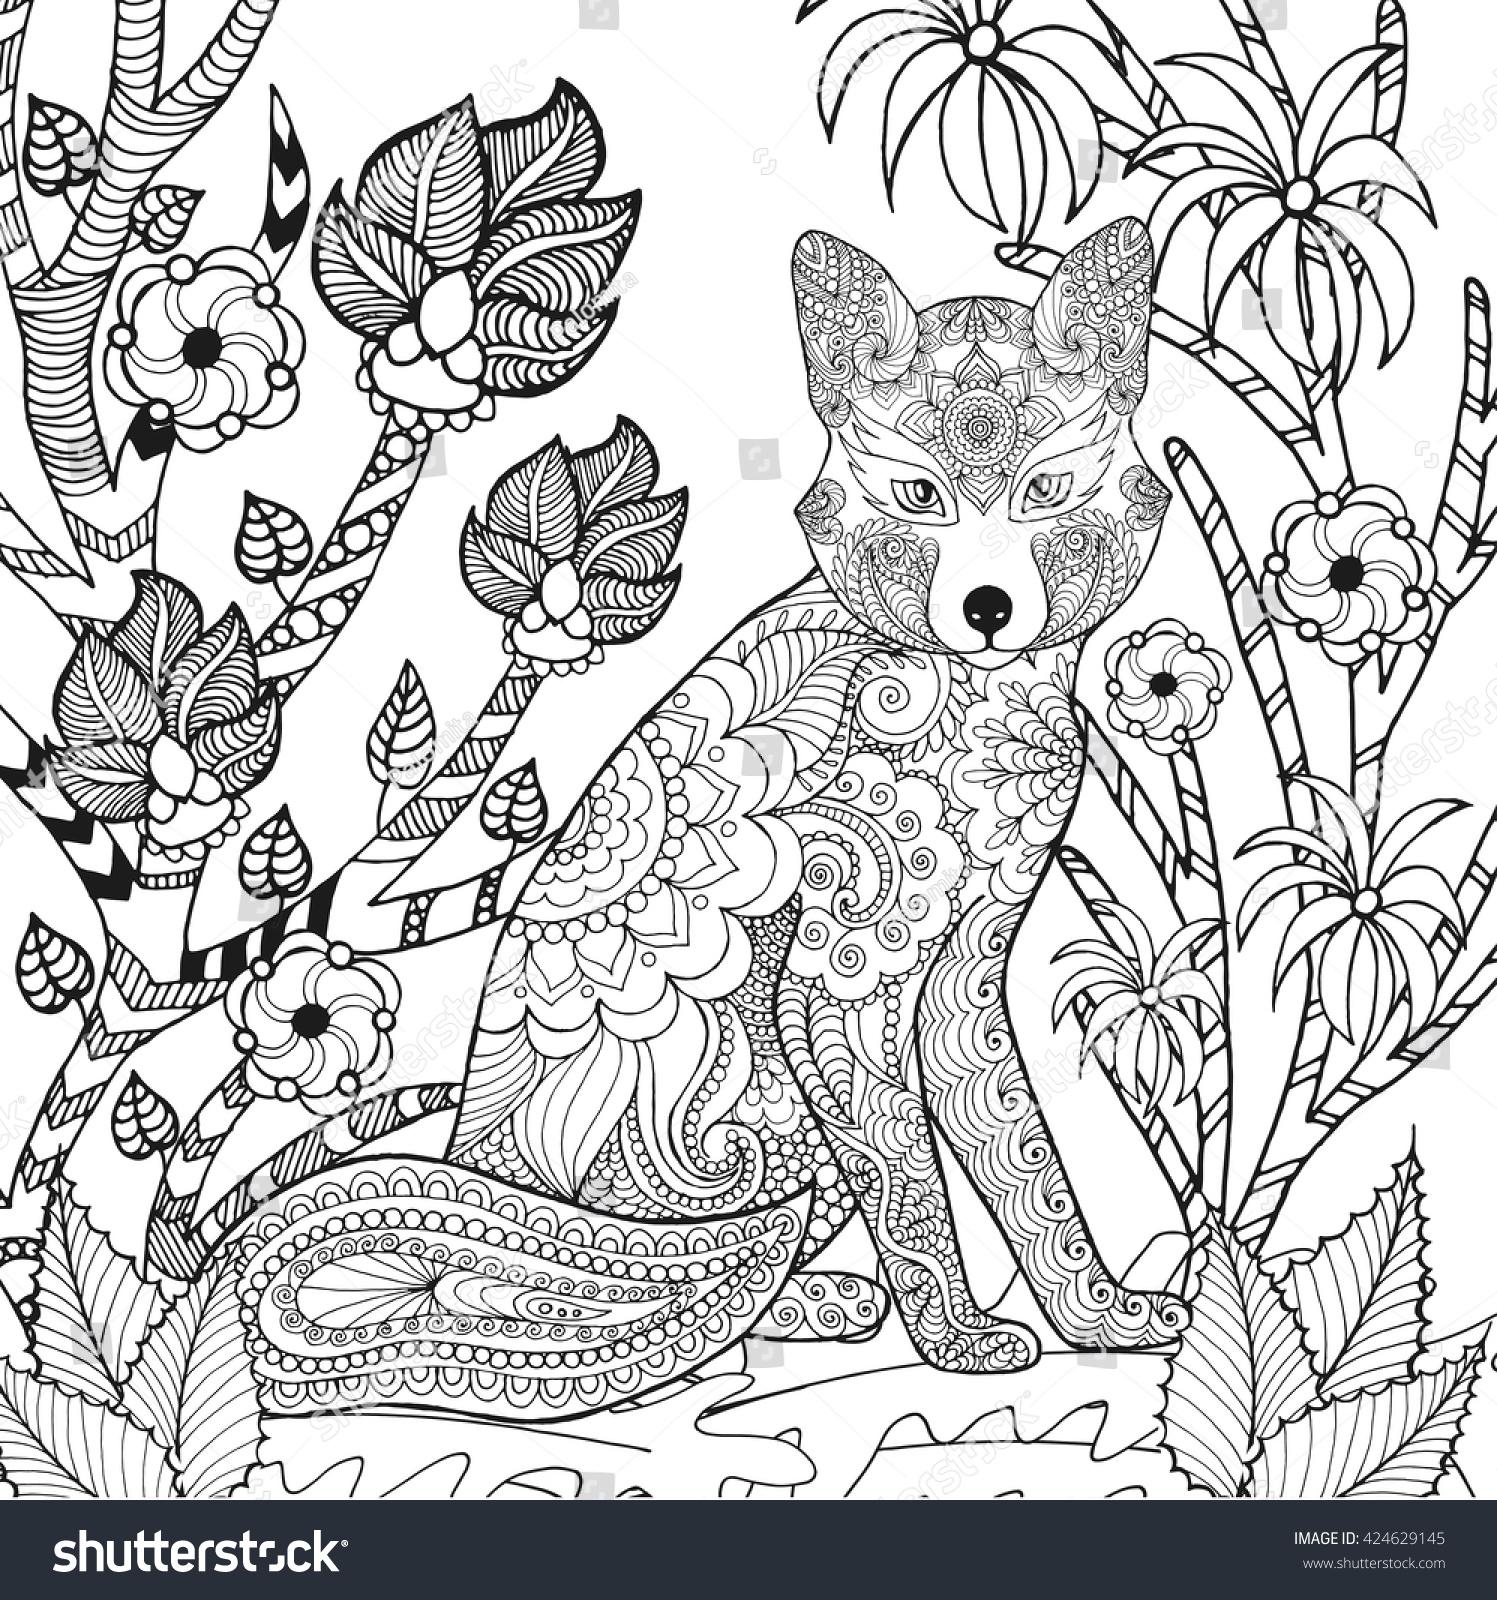 zentangle stylized fox fantasy garden animals stock vector